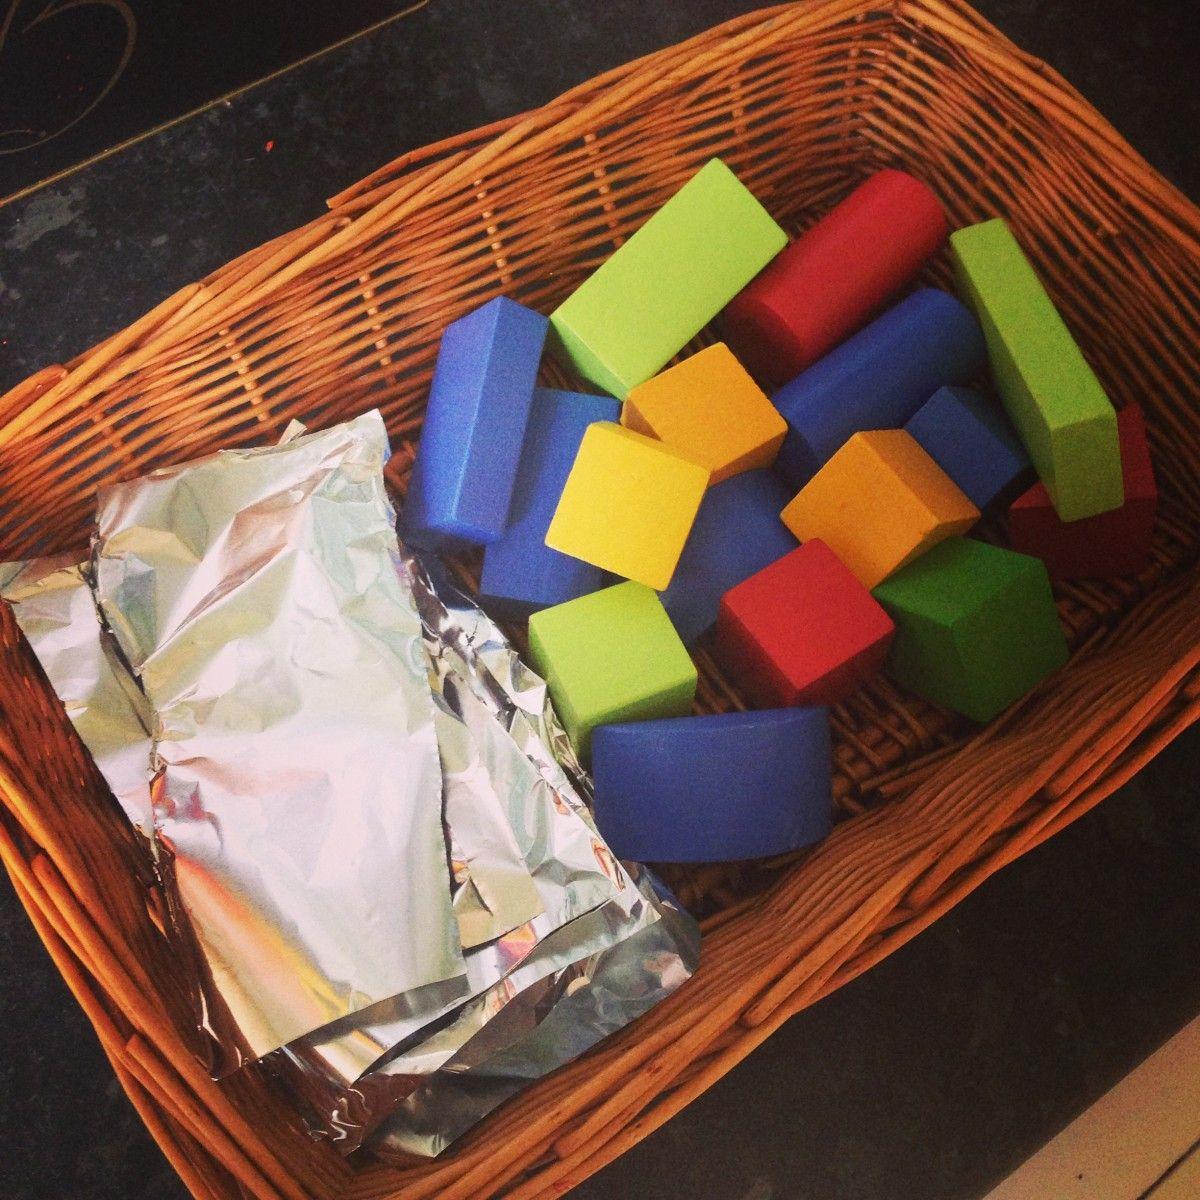 Invitation To Play With Blocks